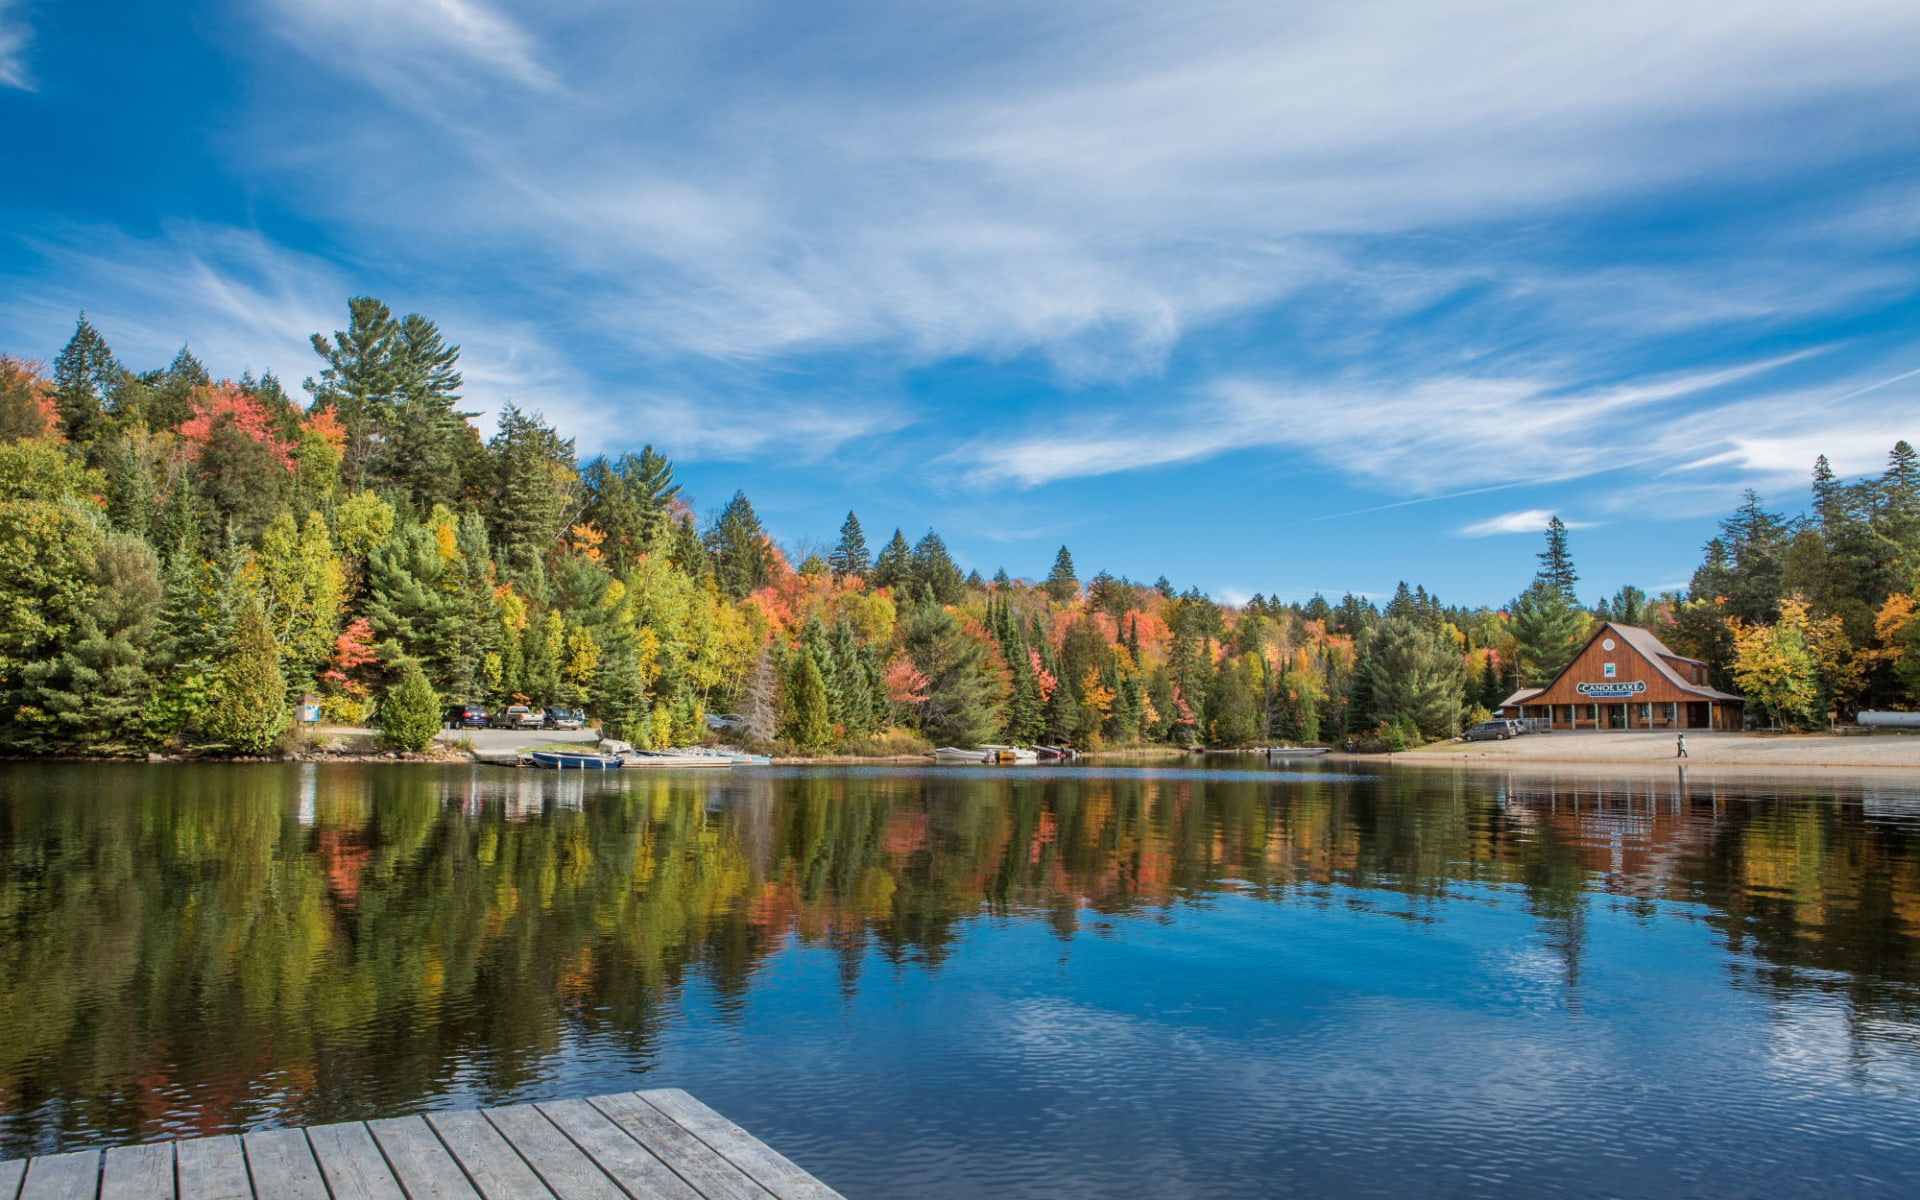 Ontarios charmante Country Inns ab Toronto: Kanada - Algonquin Provincial Park - Aussicht auf See